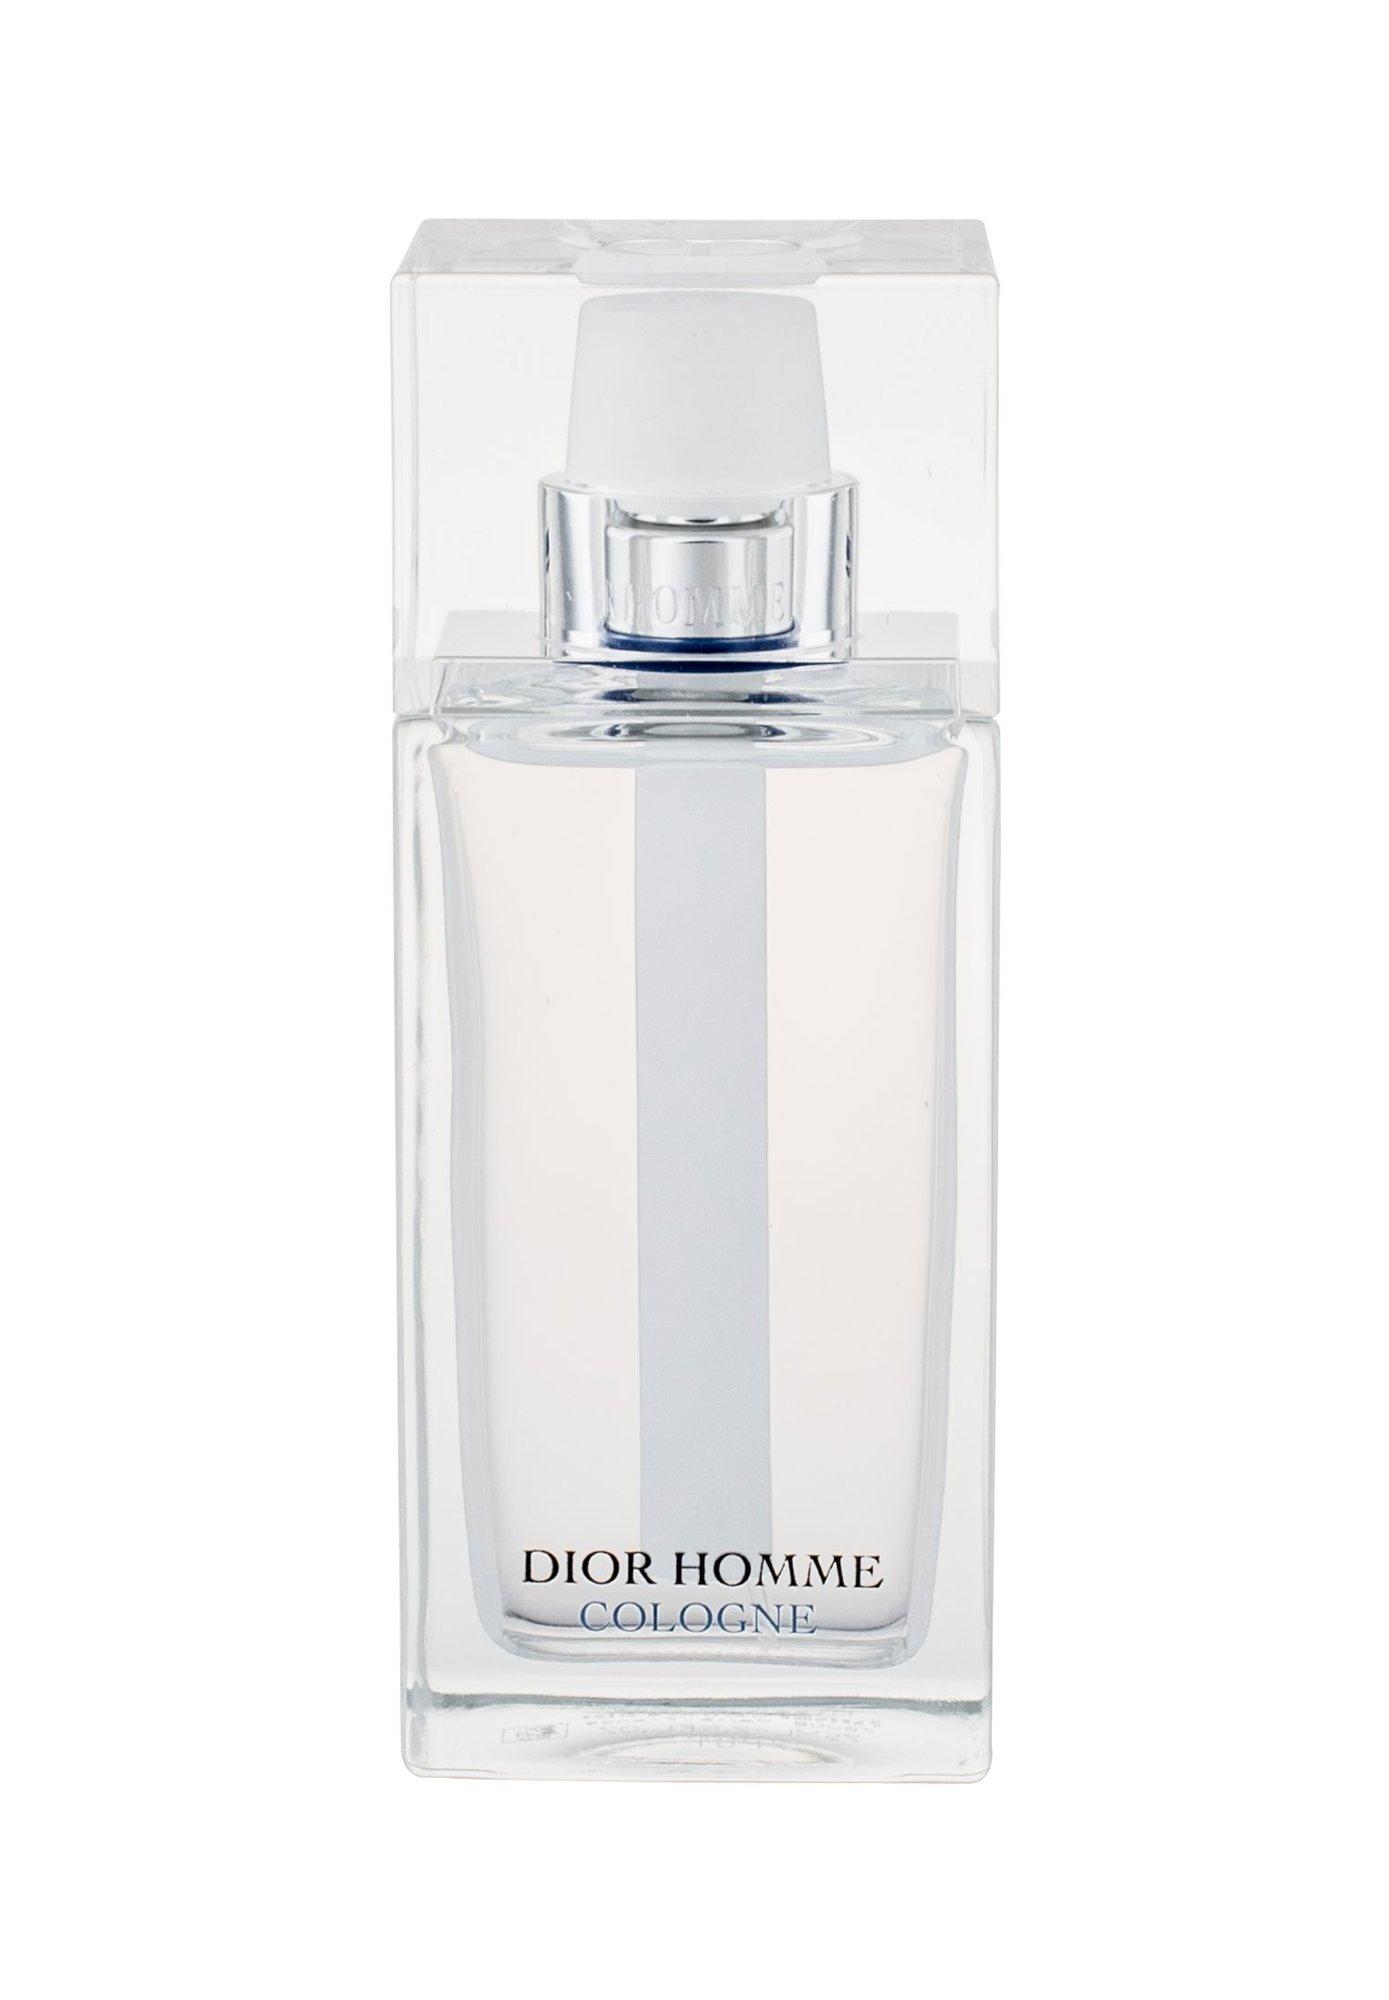 Christian Dior Dior Homme Cologne Cologne 75ml